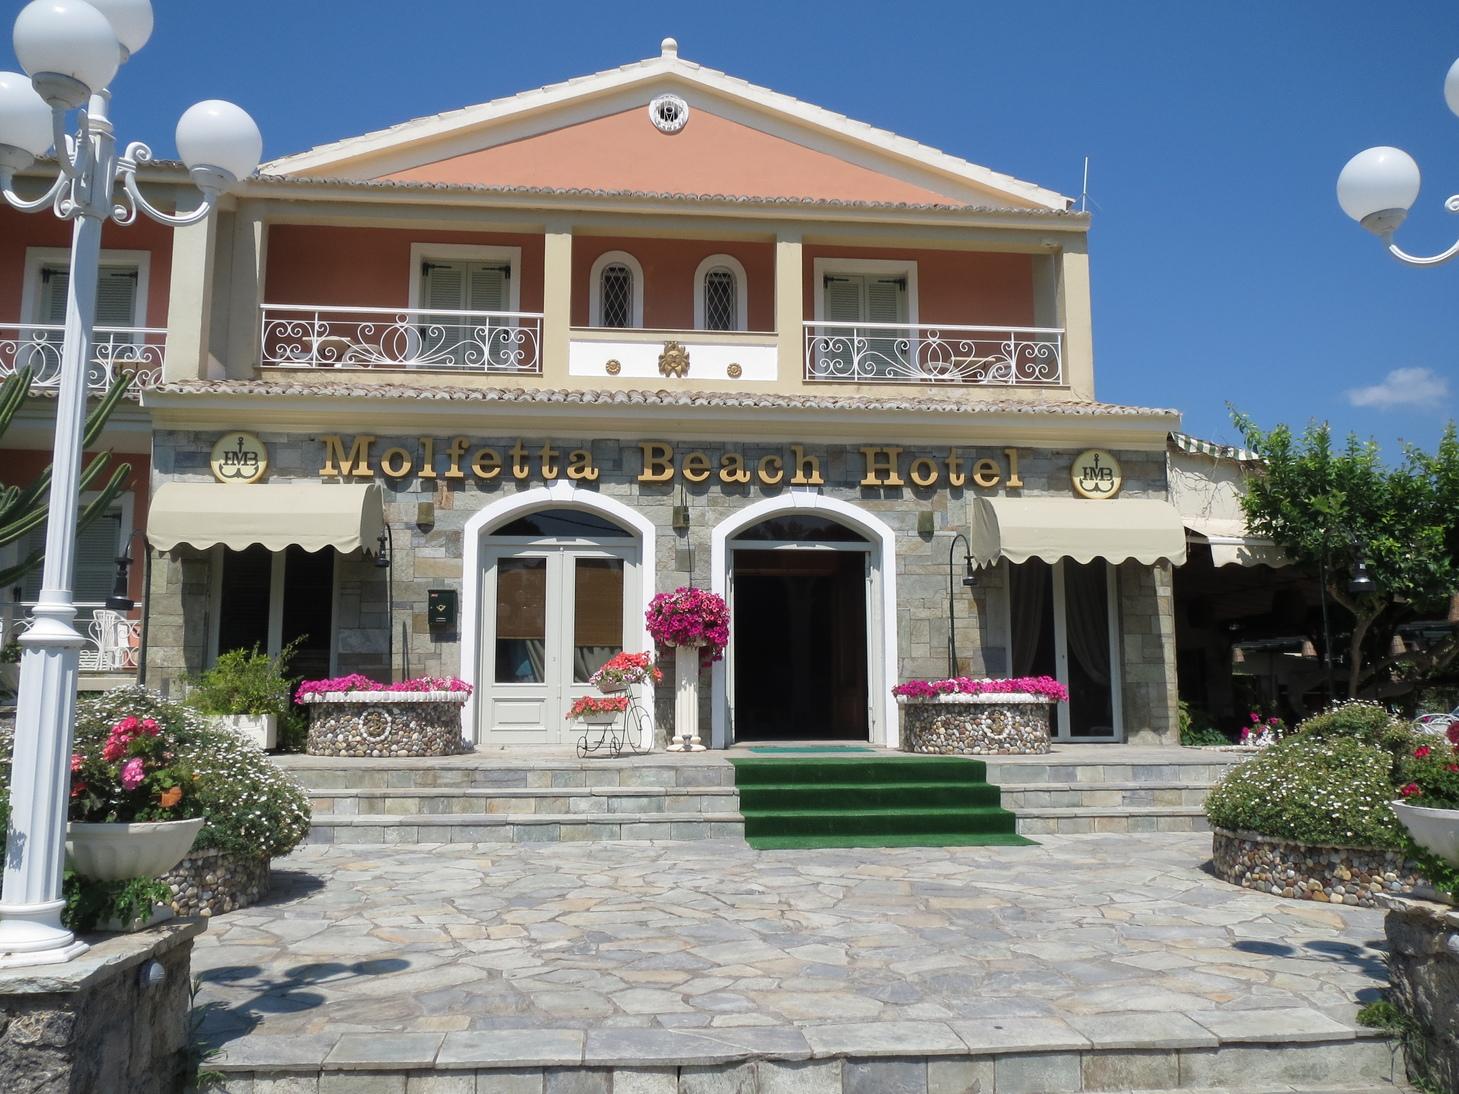 Grcka hoteli letovanje, Krf, Guvia, Molfetta  Beach, eksterijer